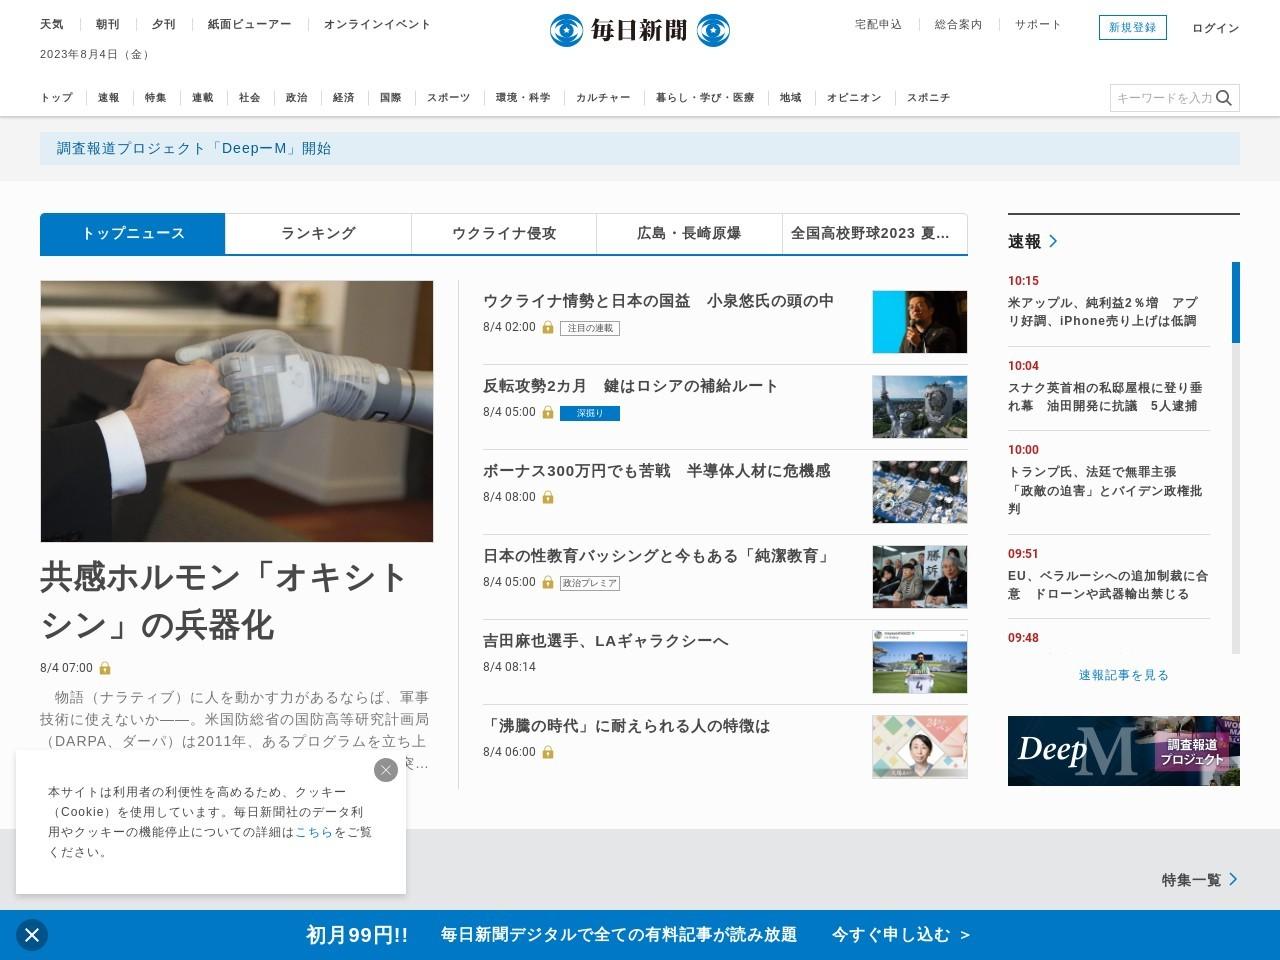 http://mainichi.jp/articles/20160222/k00/00e/040/219000c